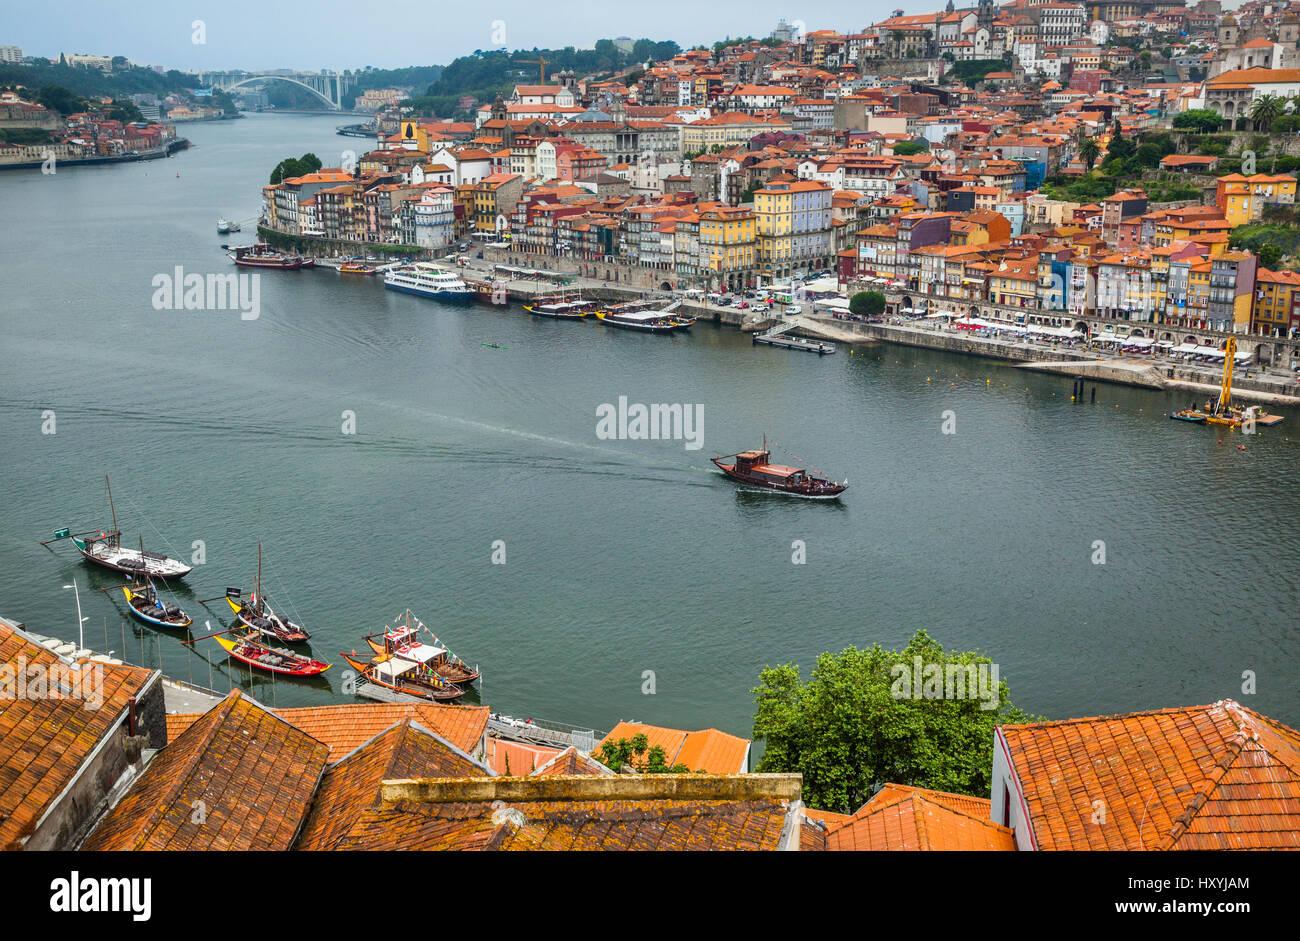 Portugal, Region Norte, Porto, view across Douro River from Vila Nova de Gaia to the historical center of Porto - Stock Image